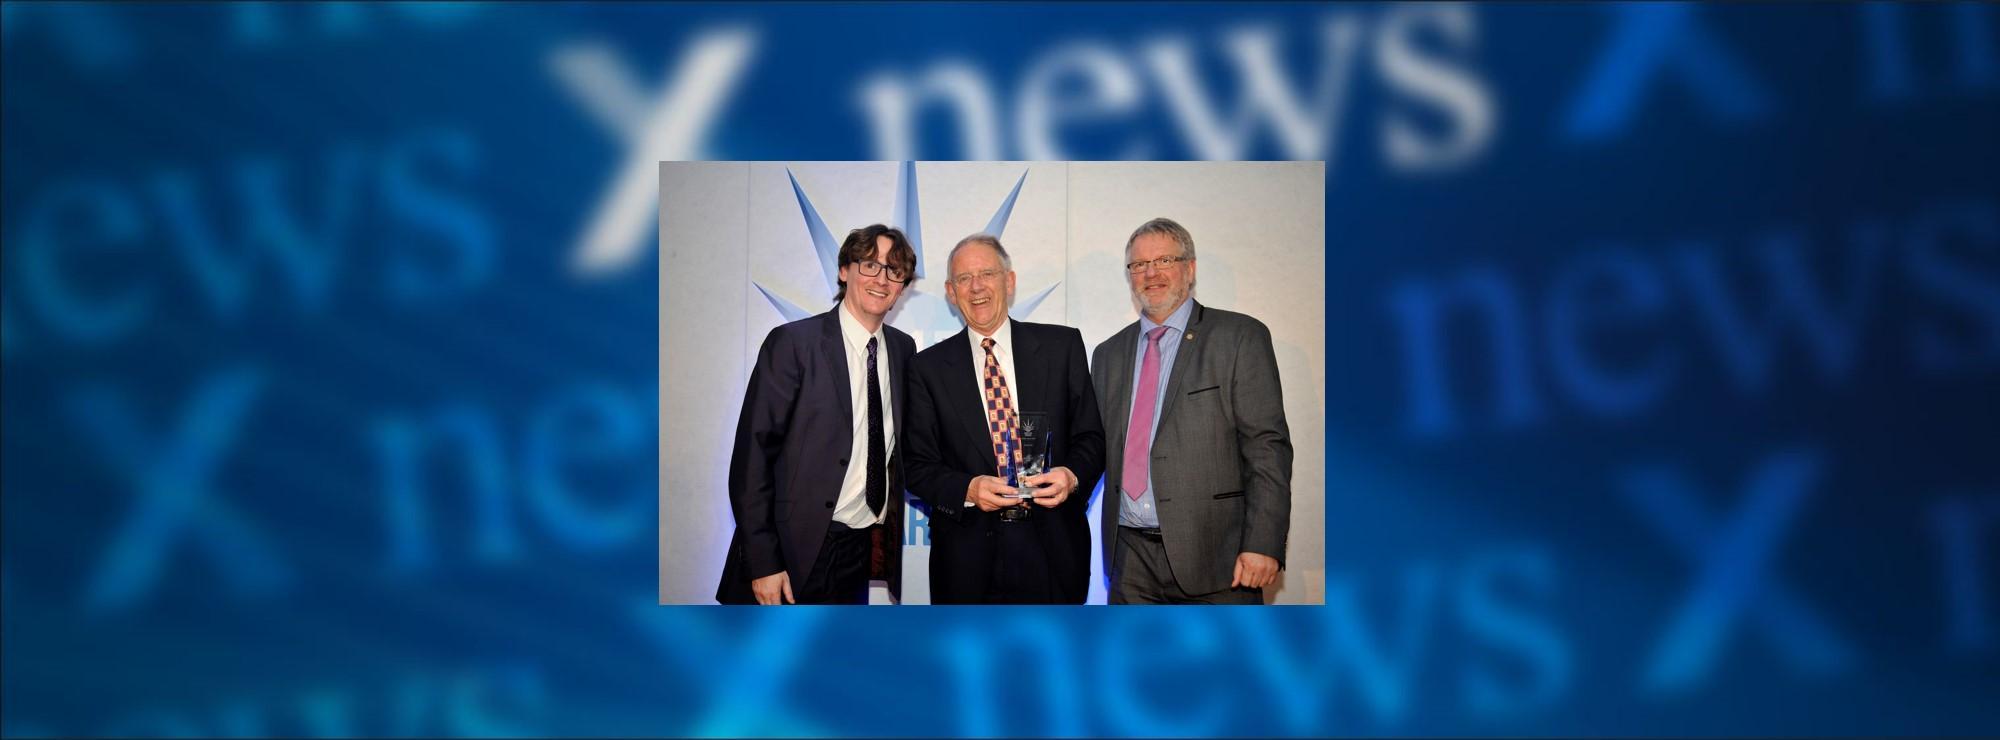 AlanGreen recognised bythe HVAC industry